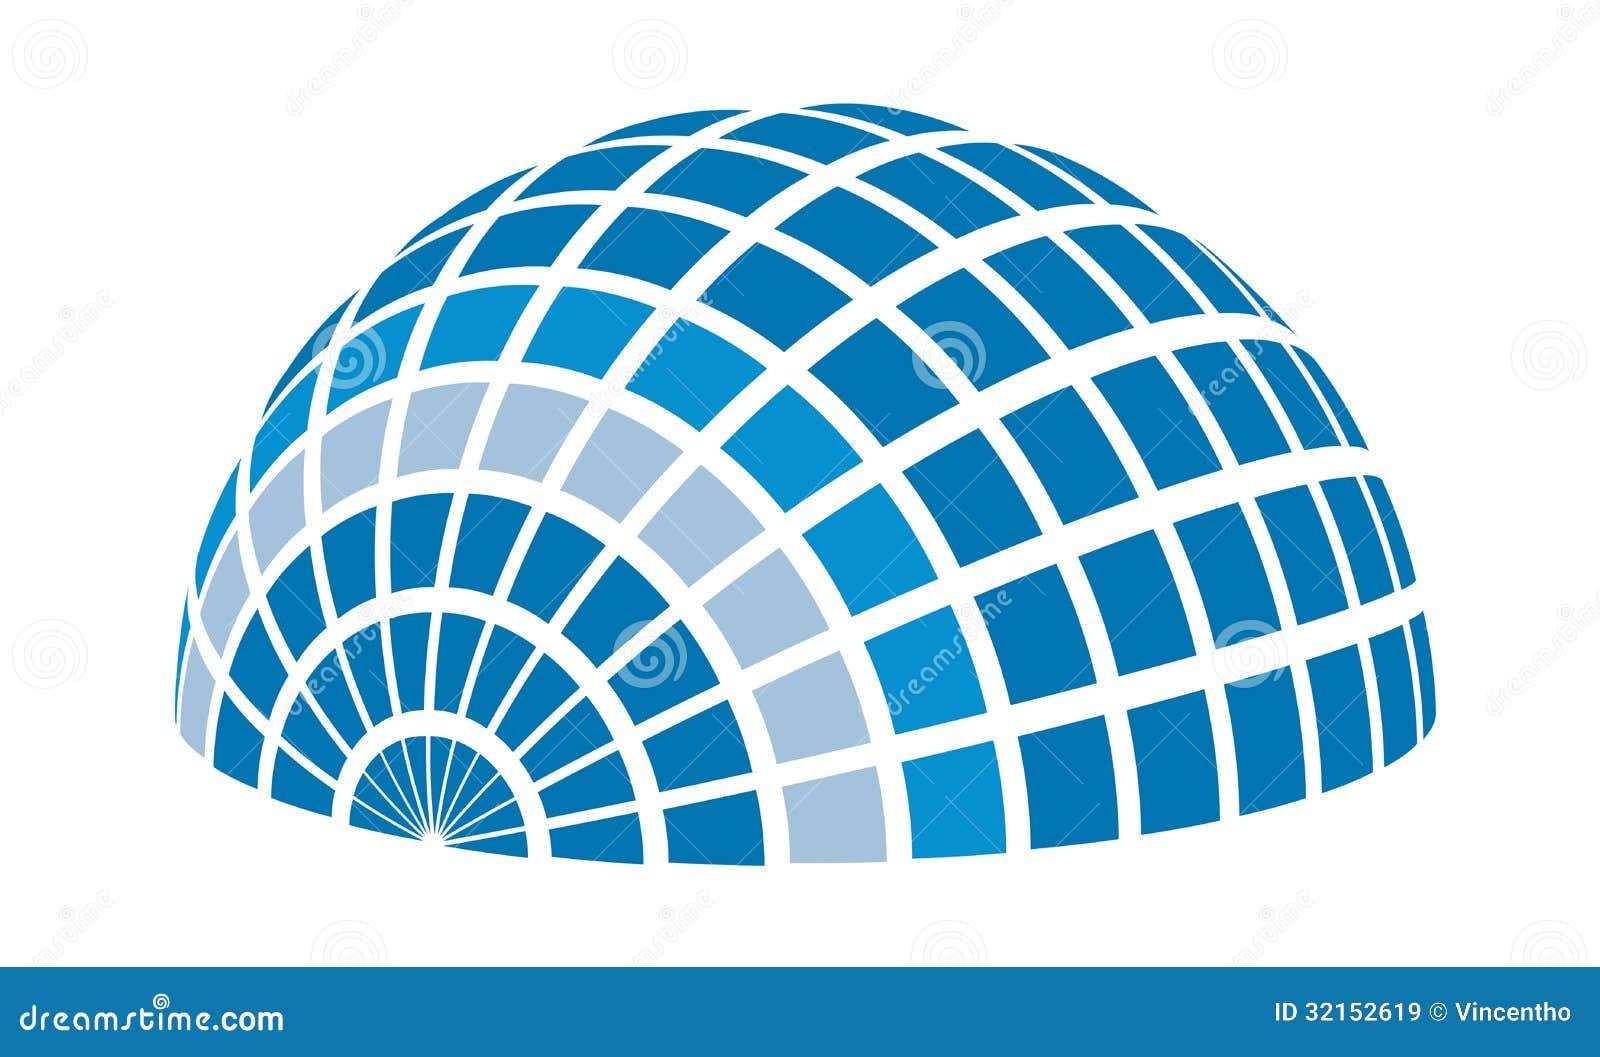 sun ray dome logo element illustration illustration de sun rays clip art images sun rays clip art transparent